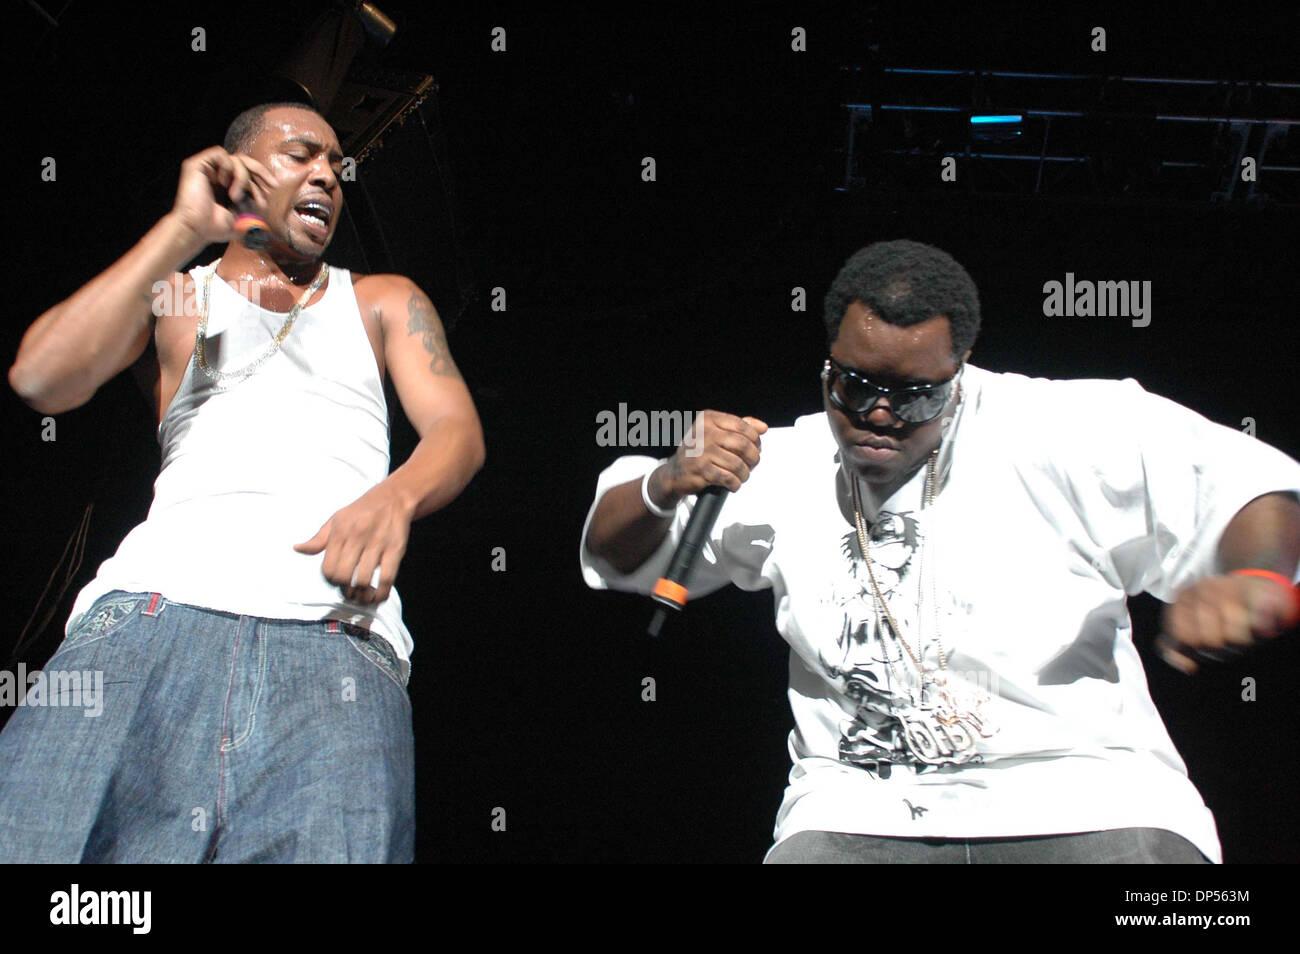 Sep 03, 2006; Raleigh, NC, USA; Hip-hop band 'Dem Franchisz Boyz' perform live in concert at at the Alltel Pavillion Stock Photo